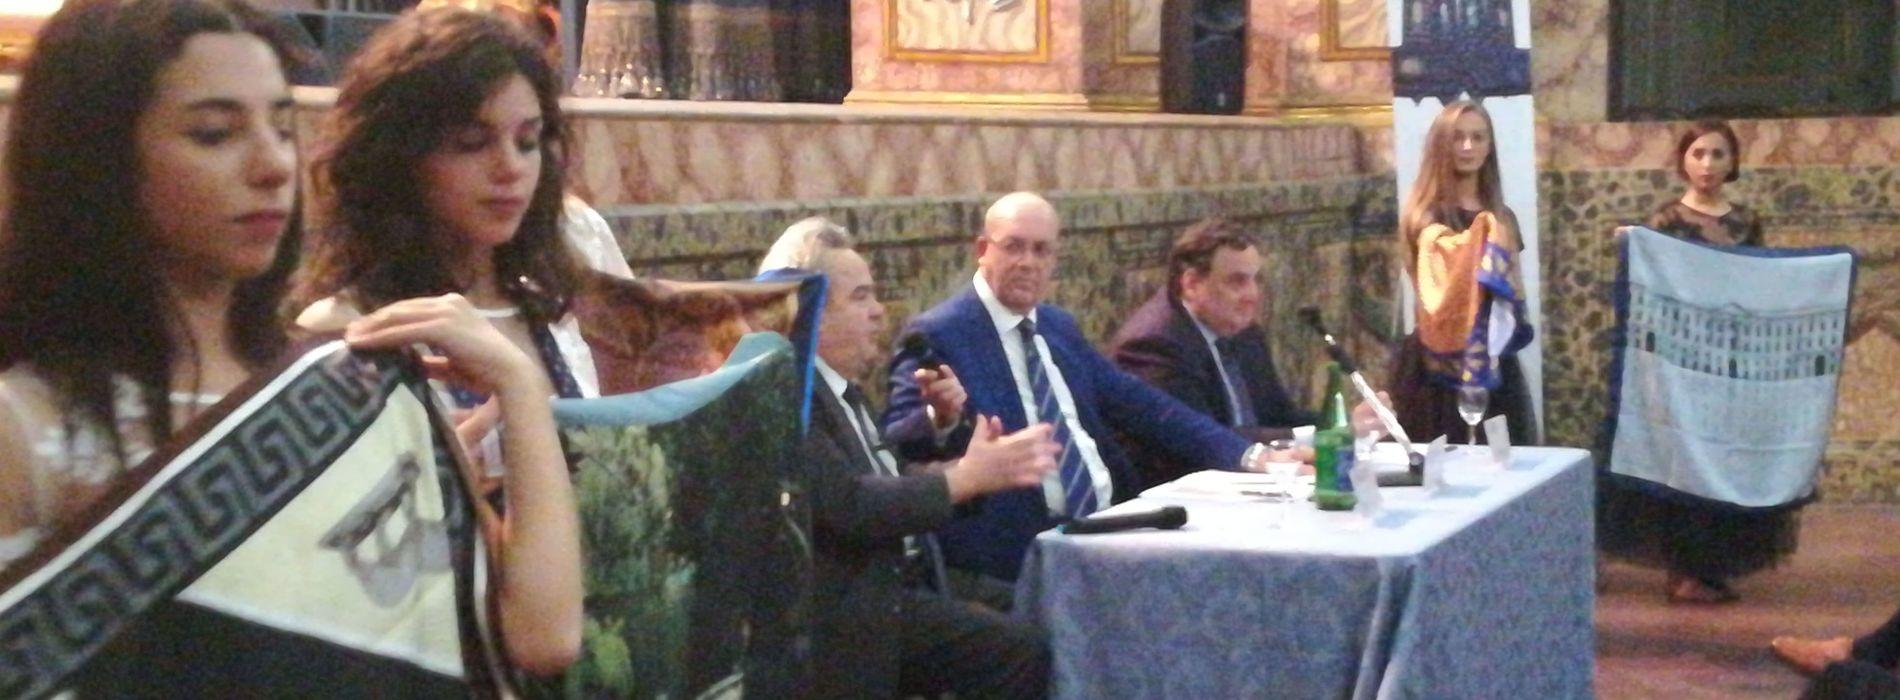 Reggia style, cravatte e foulard di Ugo Cilento targate Caserta